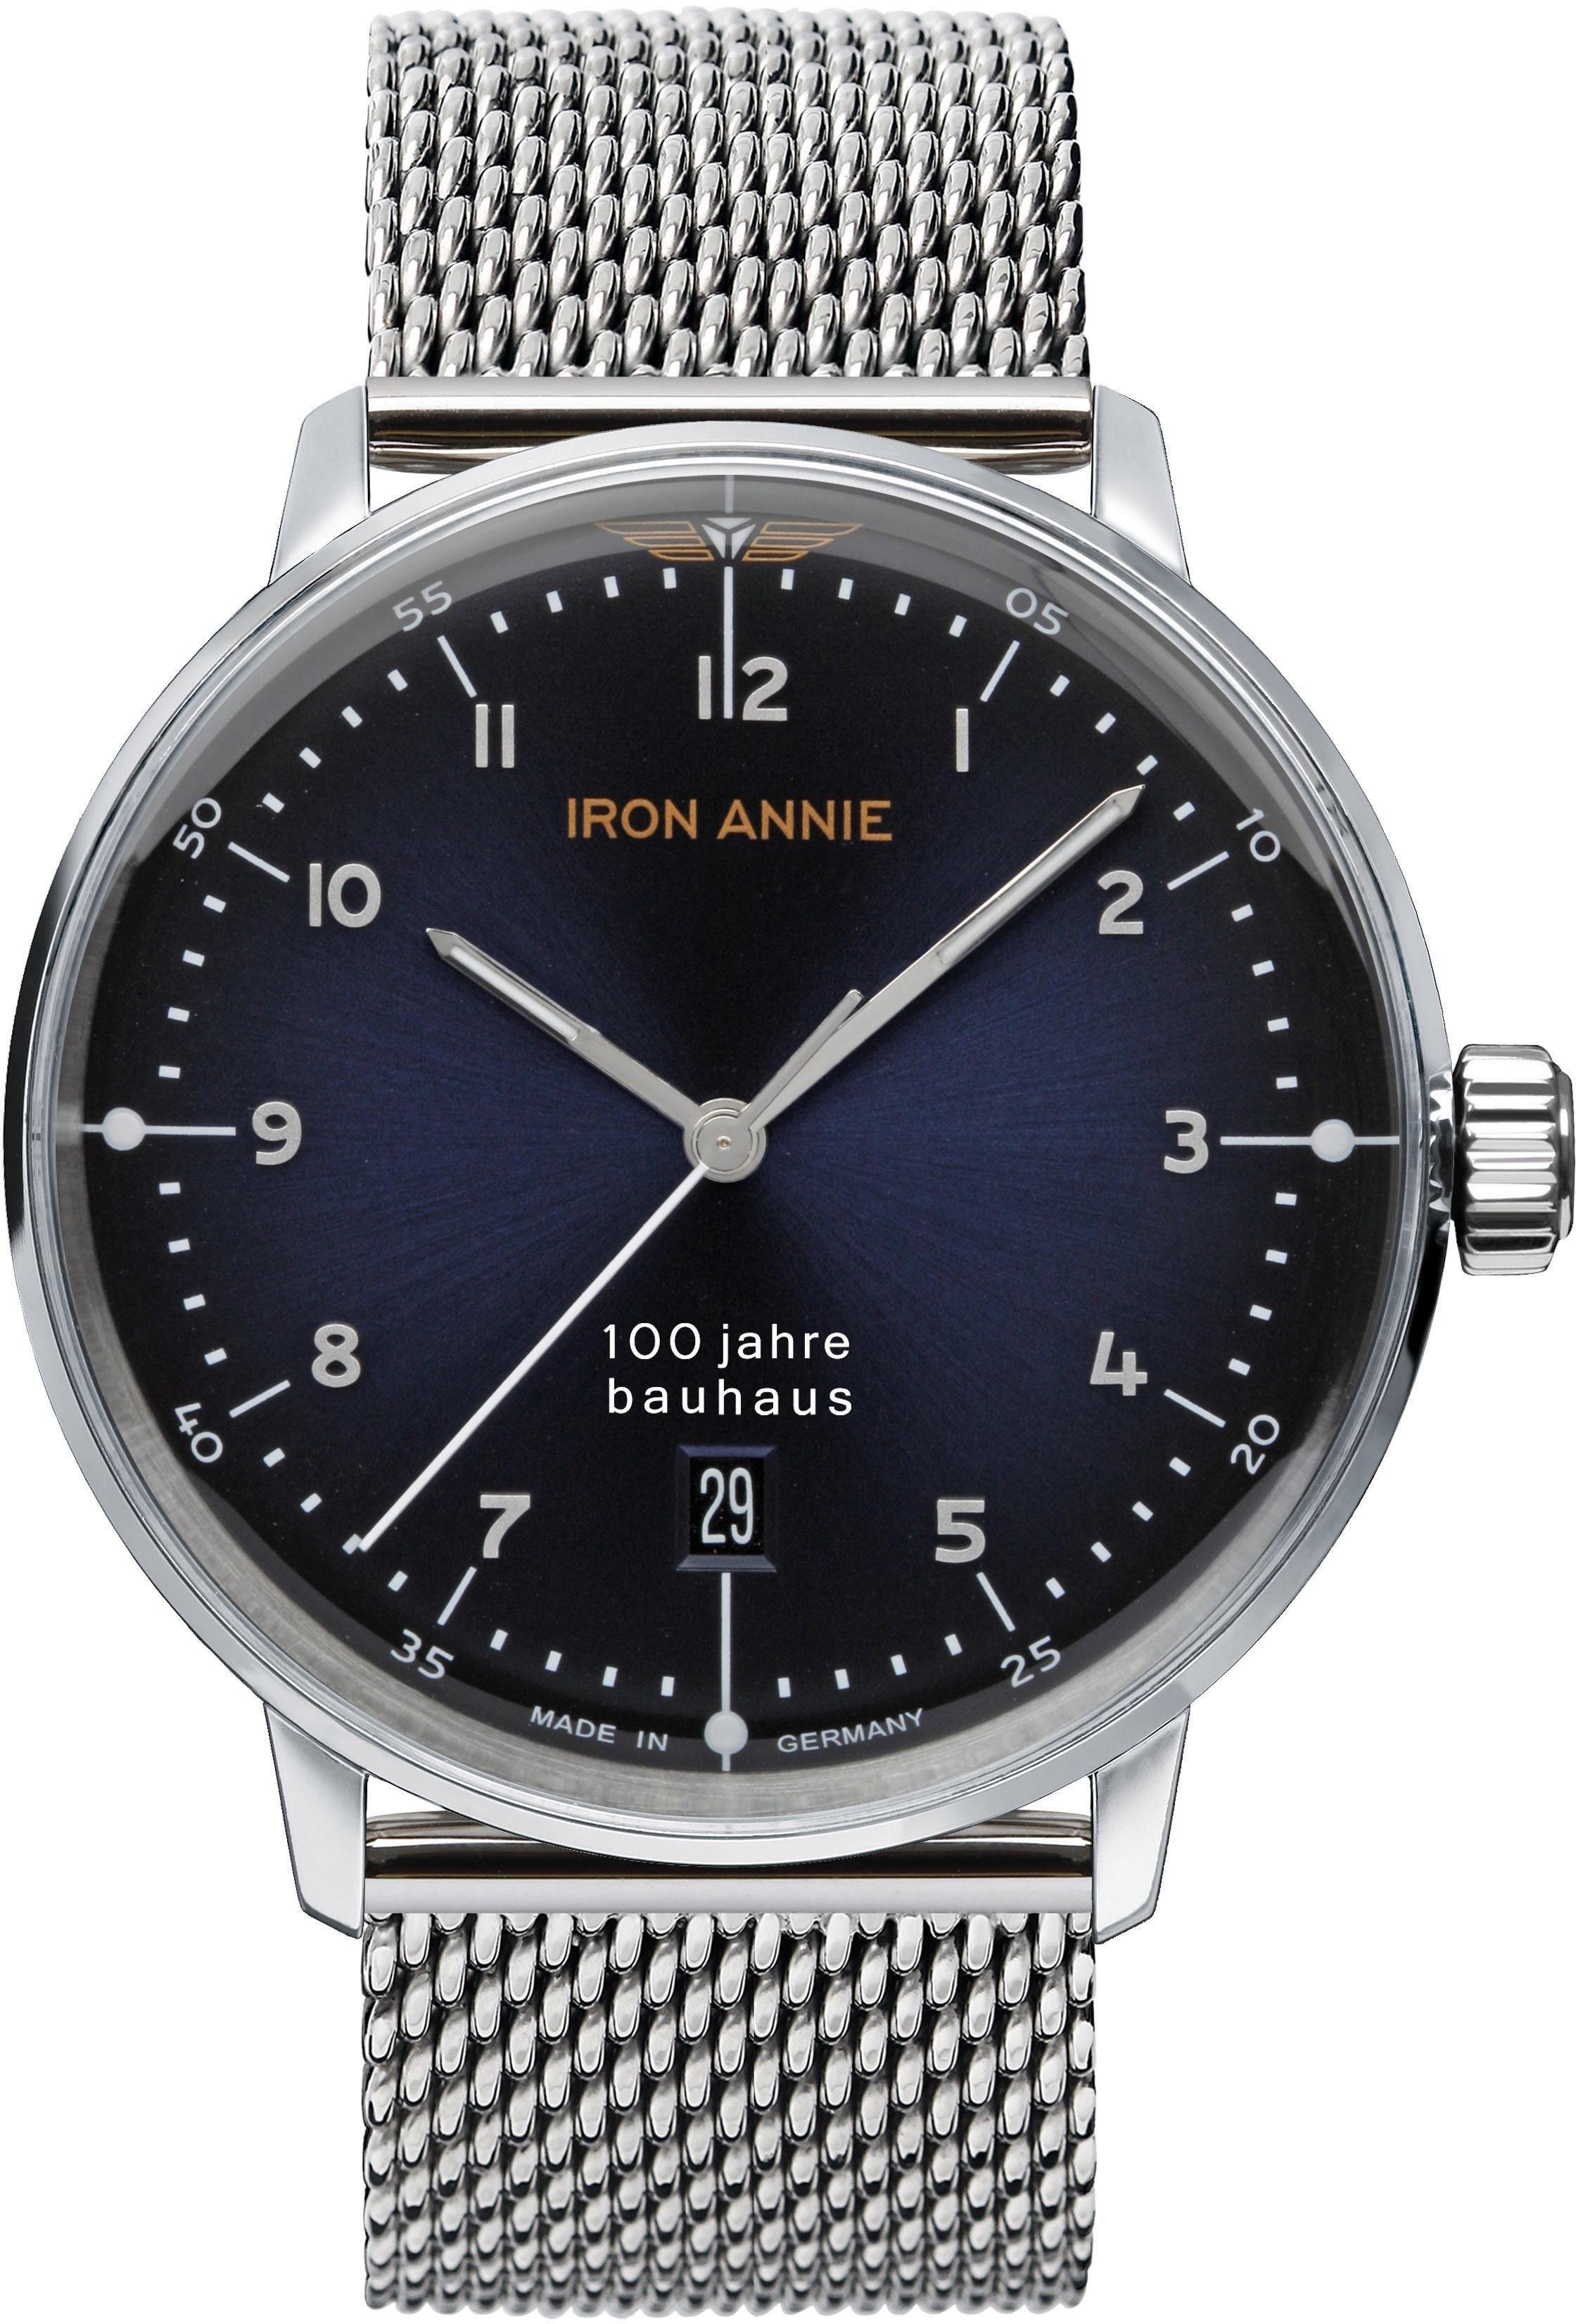 KaufenOtto Chronograph Annie »bauhaus5046m 3« Iron 3K5uTlJFc1